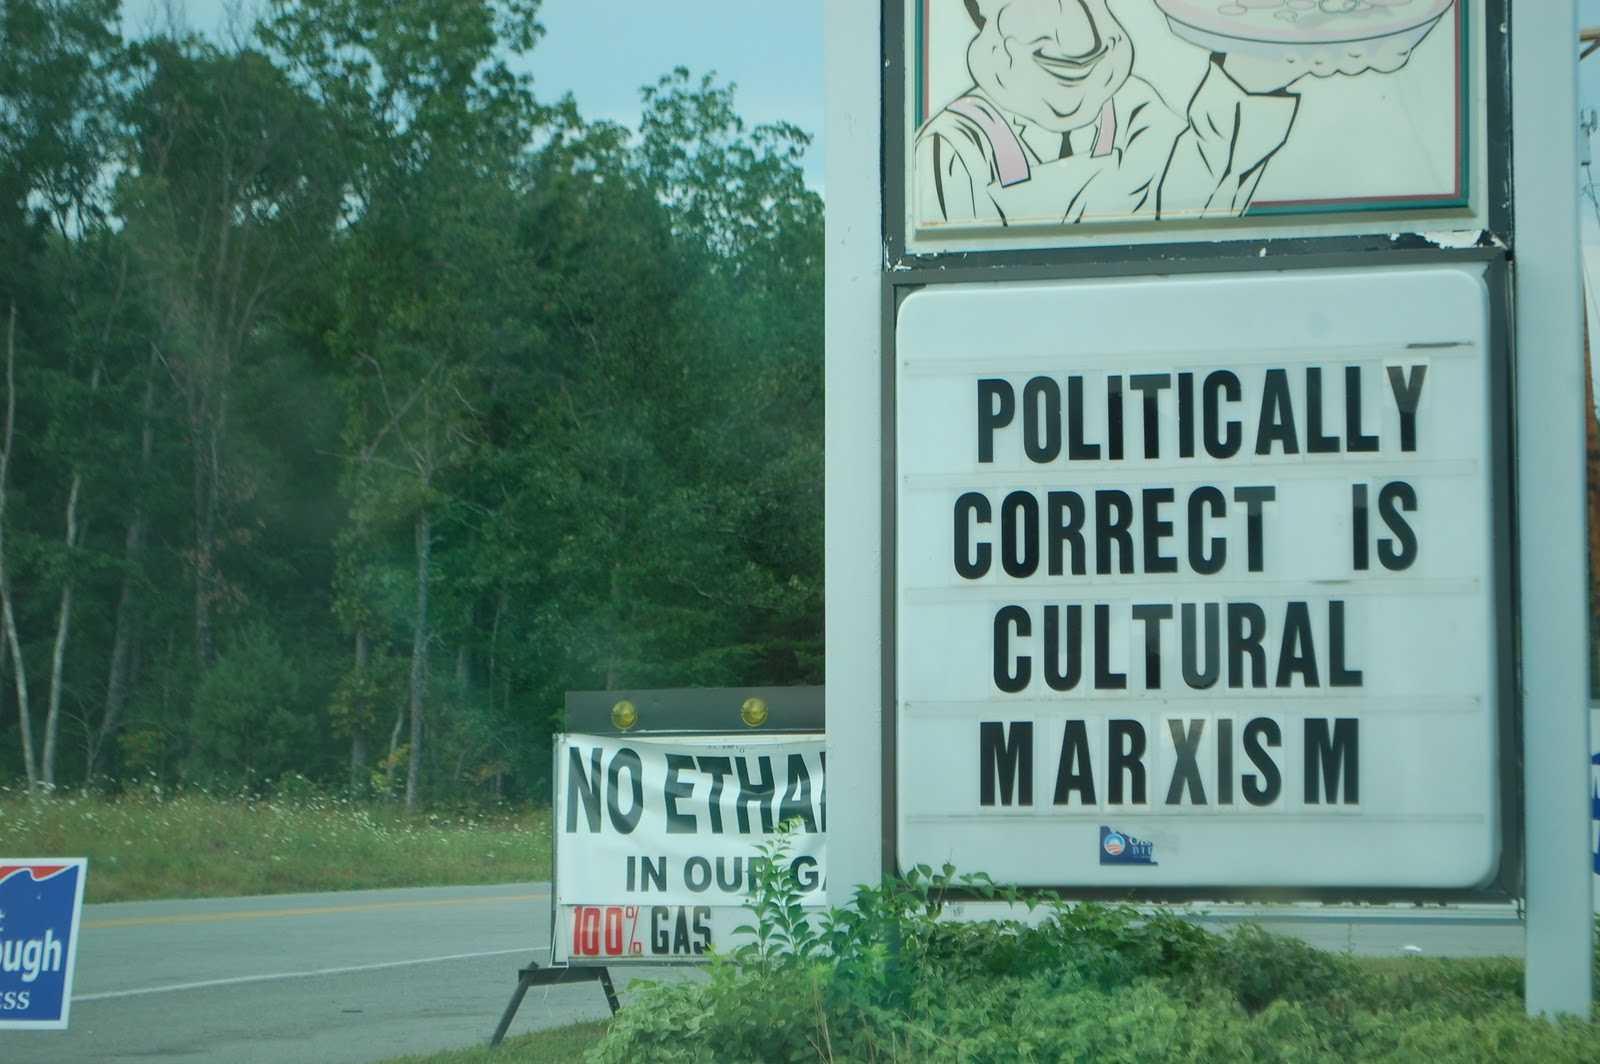 REVOLUTIA TOTALA ANTI-CRESTINA a ideologiei homosexualismului. <b>CORECTITUDINEA POLITICA: sinteza intre COMUNISM si NEOLIBERALISM</b>